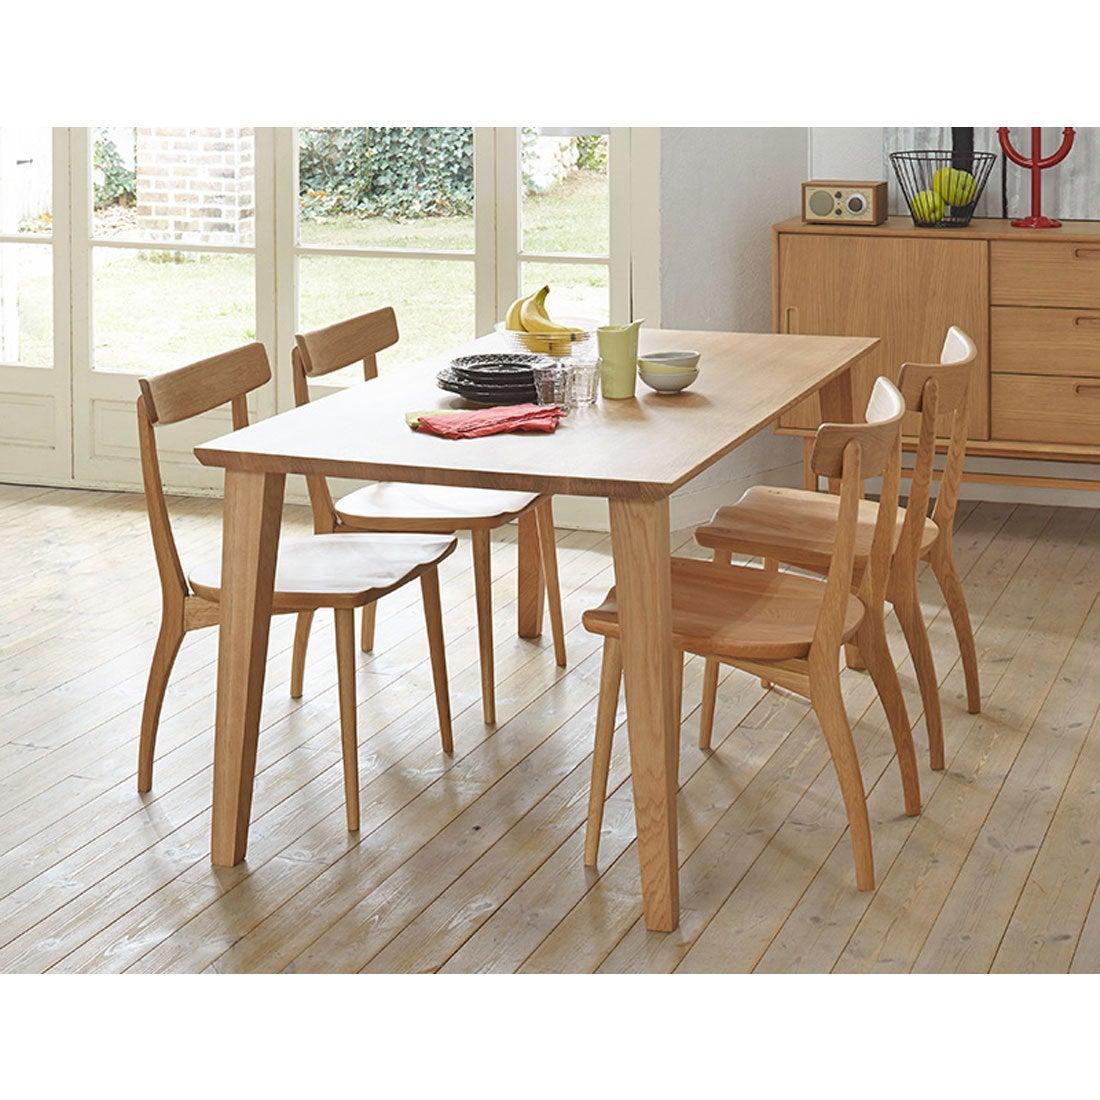 IDC OTSUKA/大塚家具 ダイニングテーブル フィル3 角天板/木製脚 W1600/オーク材WO色(ホワイトオーク)